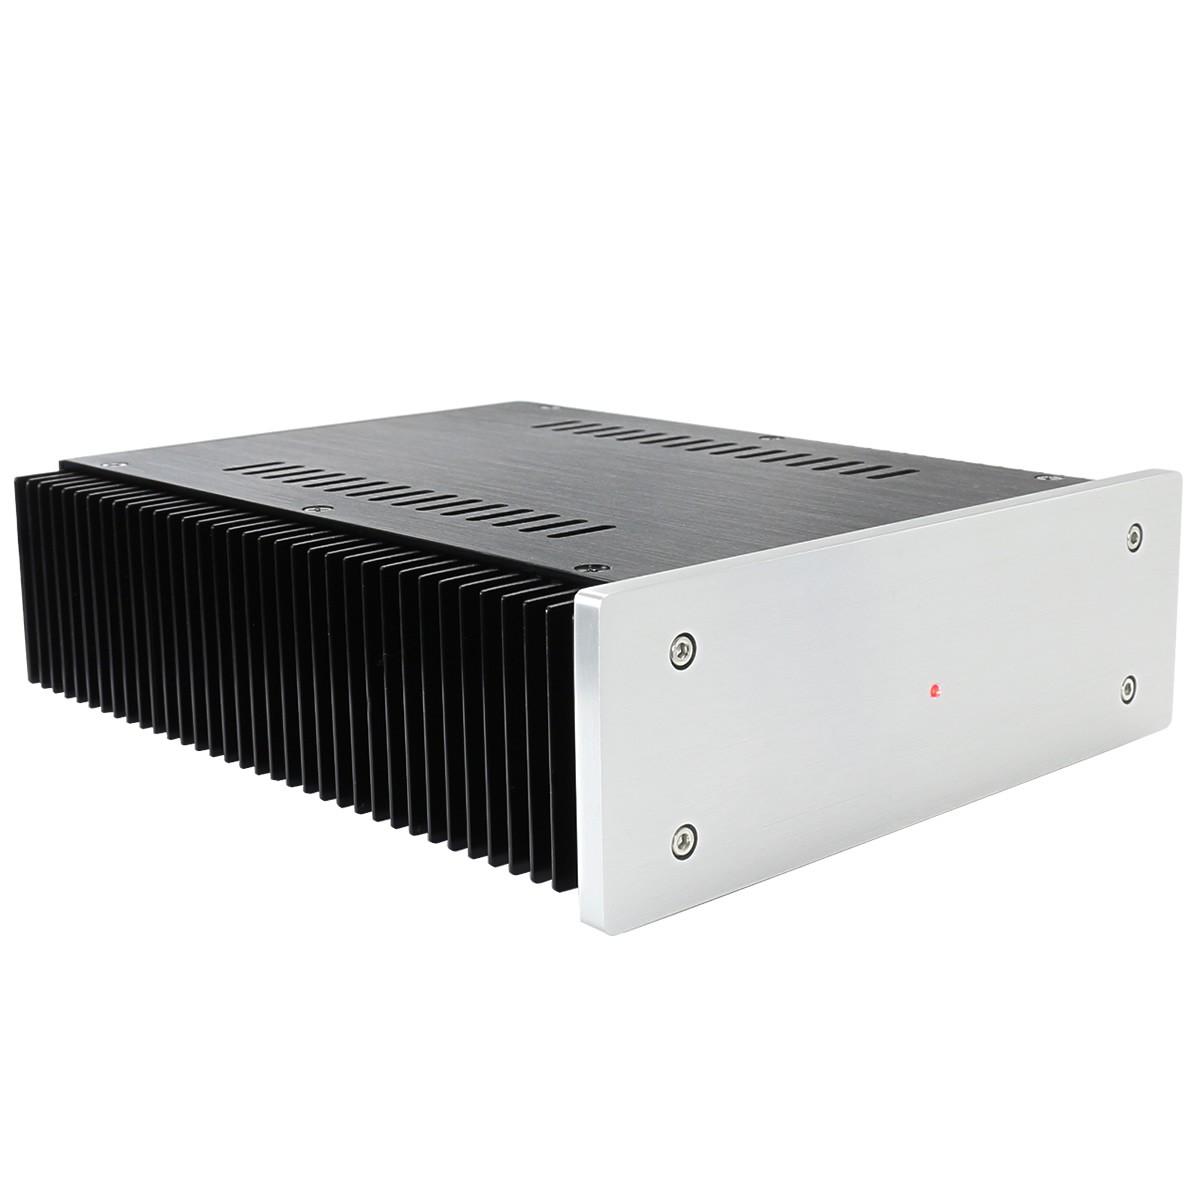 LPSU200 HiFi Linear Supply High Fidelity 12V + 5V 6.5A 150W NAS / Freebox / Squeezebox